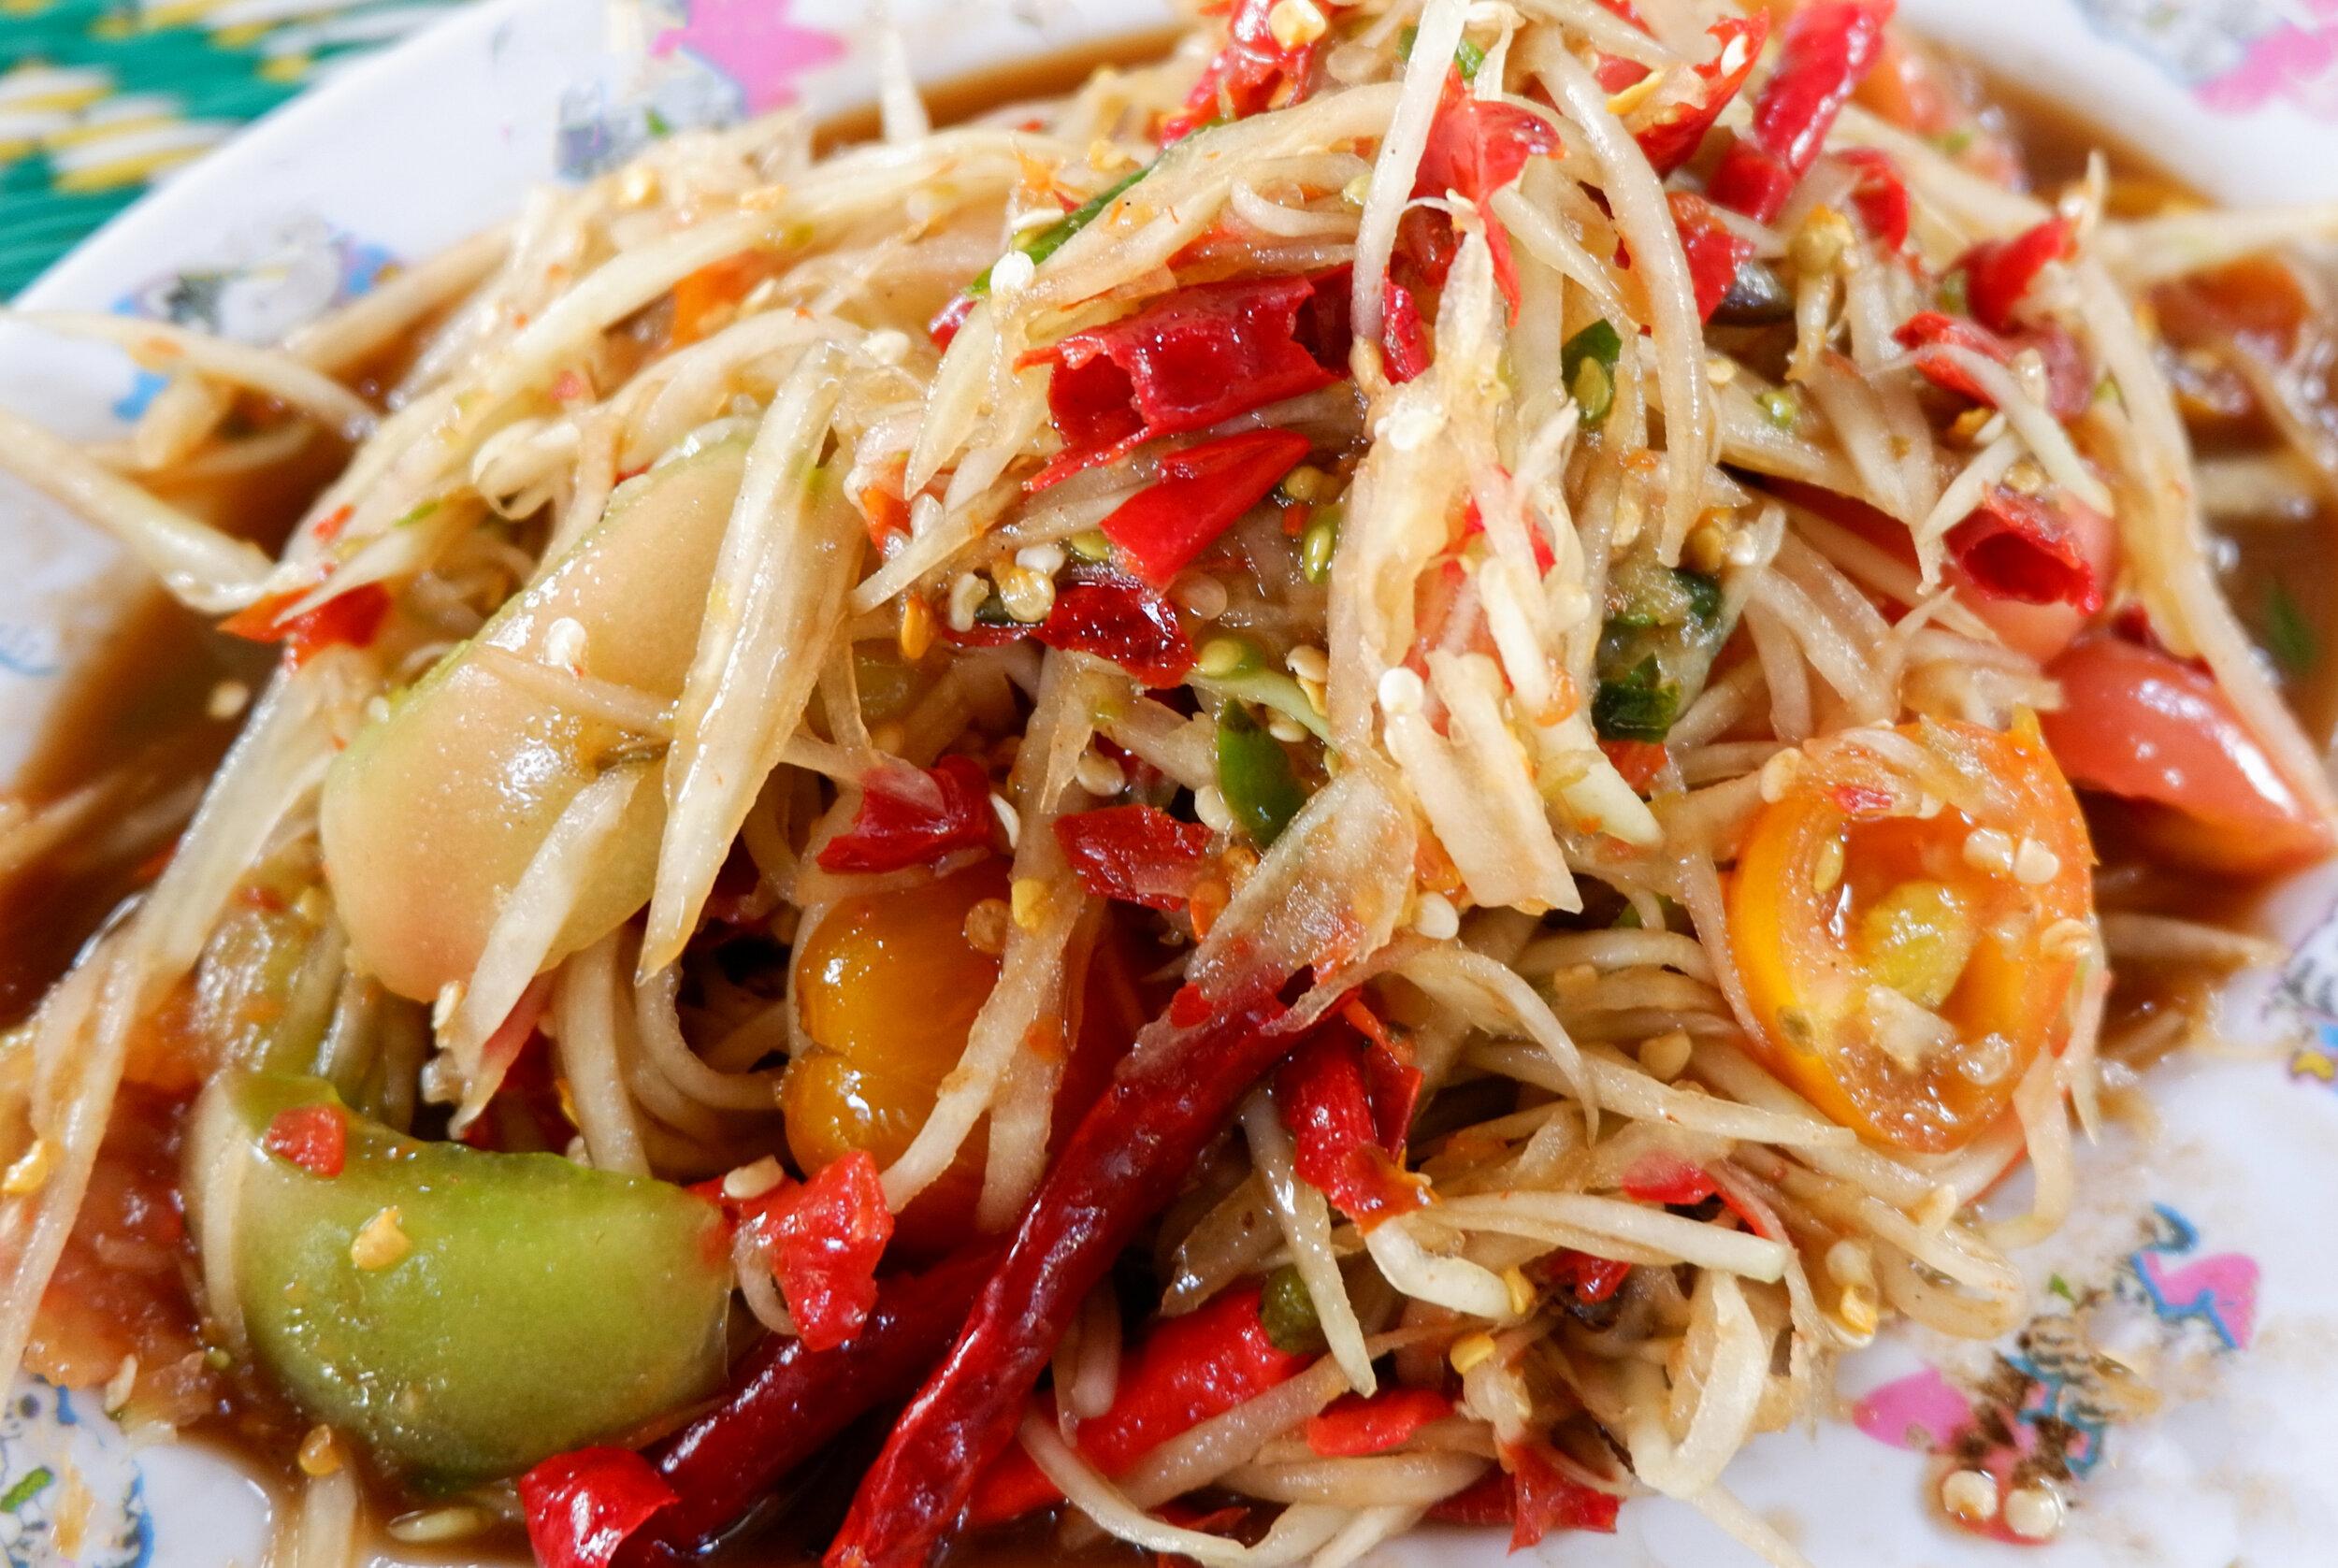 Papaya Salad, a dish bursting with Thai flavors